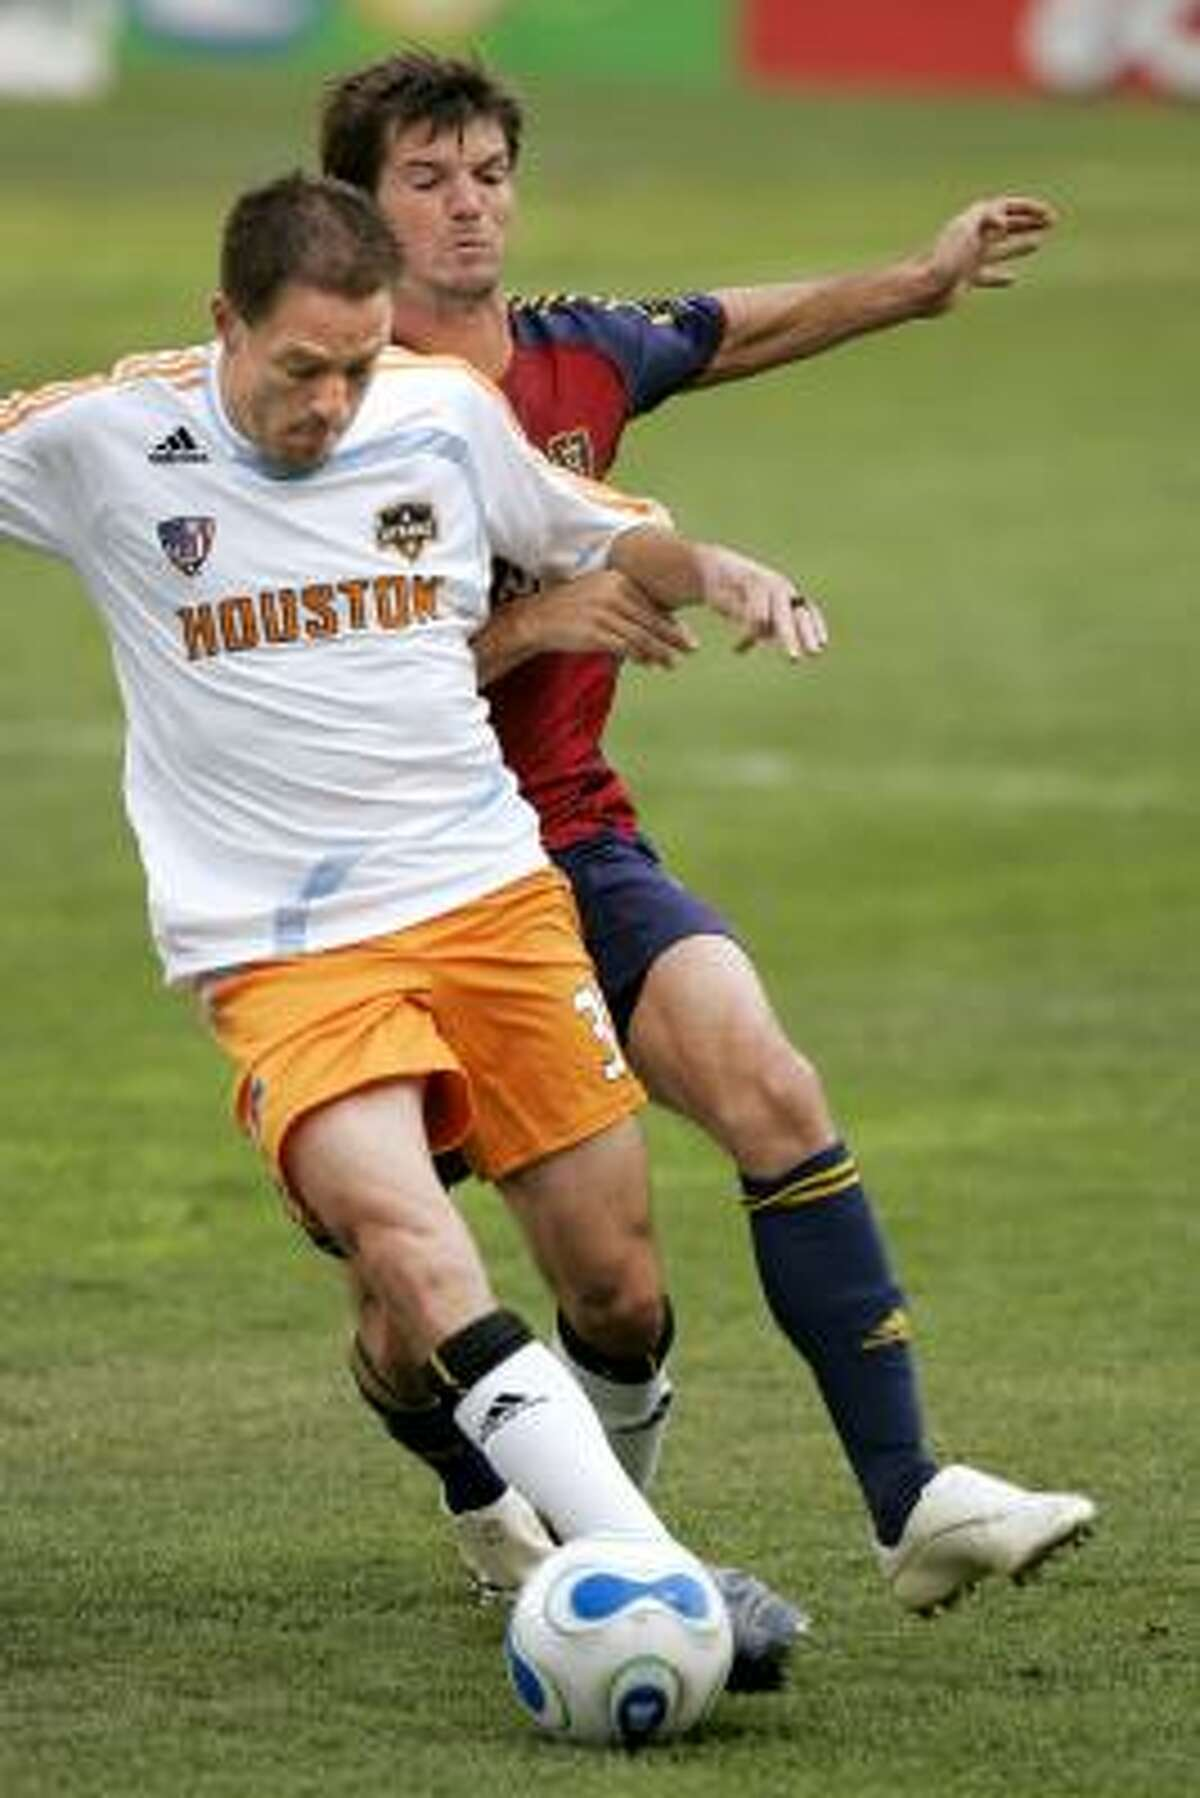 Dynamo midfieler Richard Mulrooney will miss the match against the New York Red Bulls.